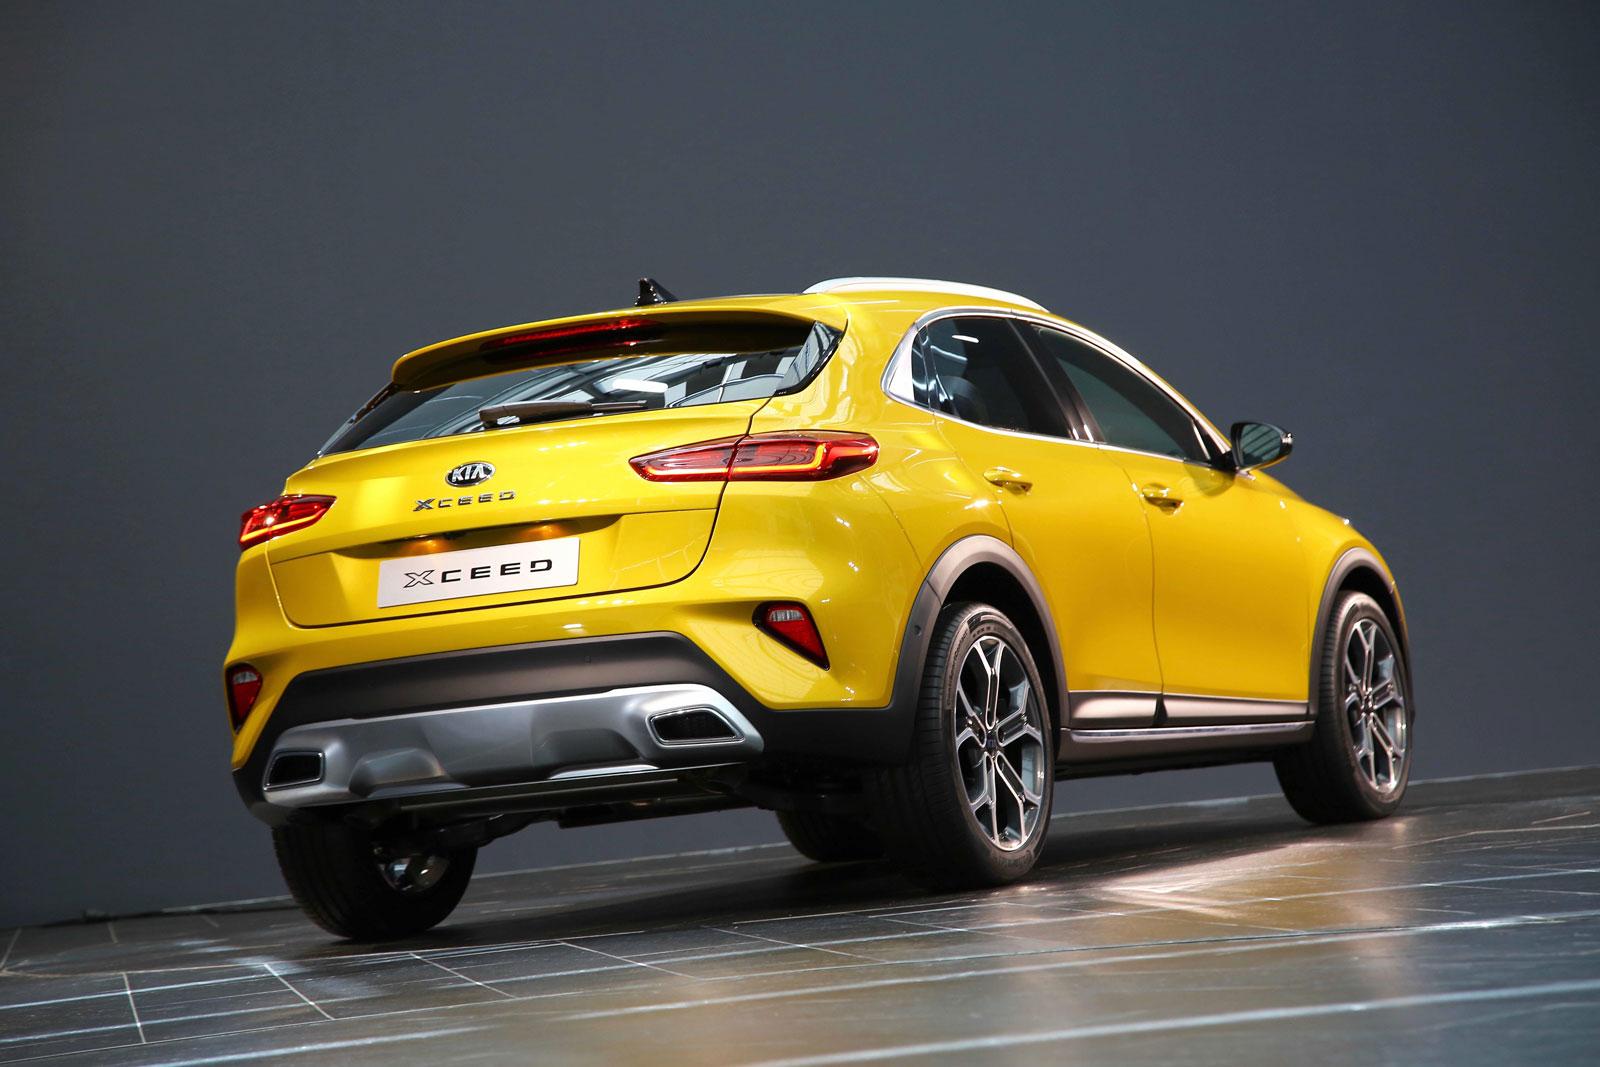 World Car Kia >> Kia XCeed - Car Body Design